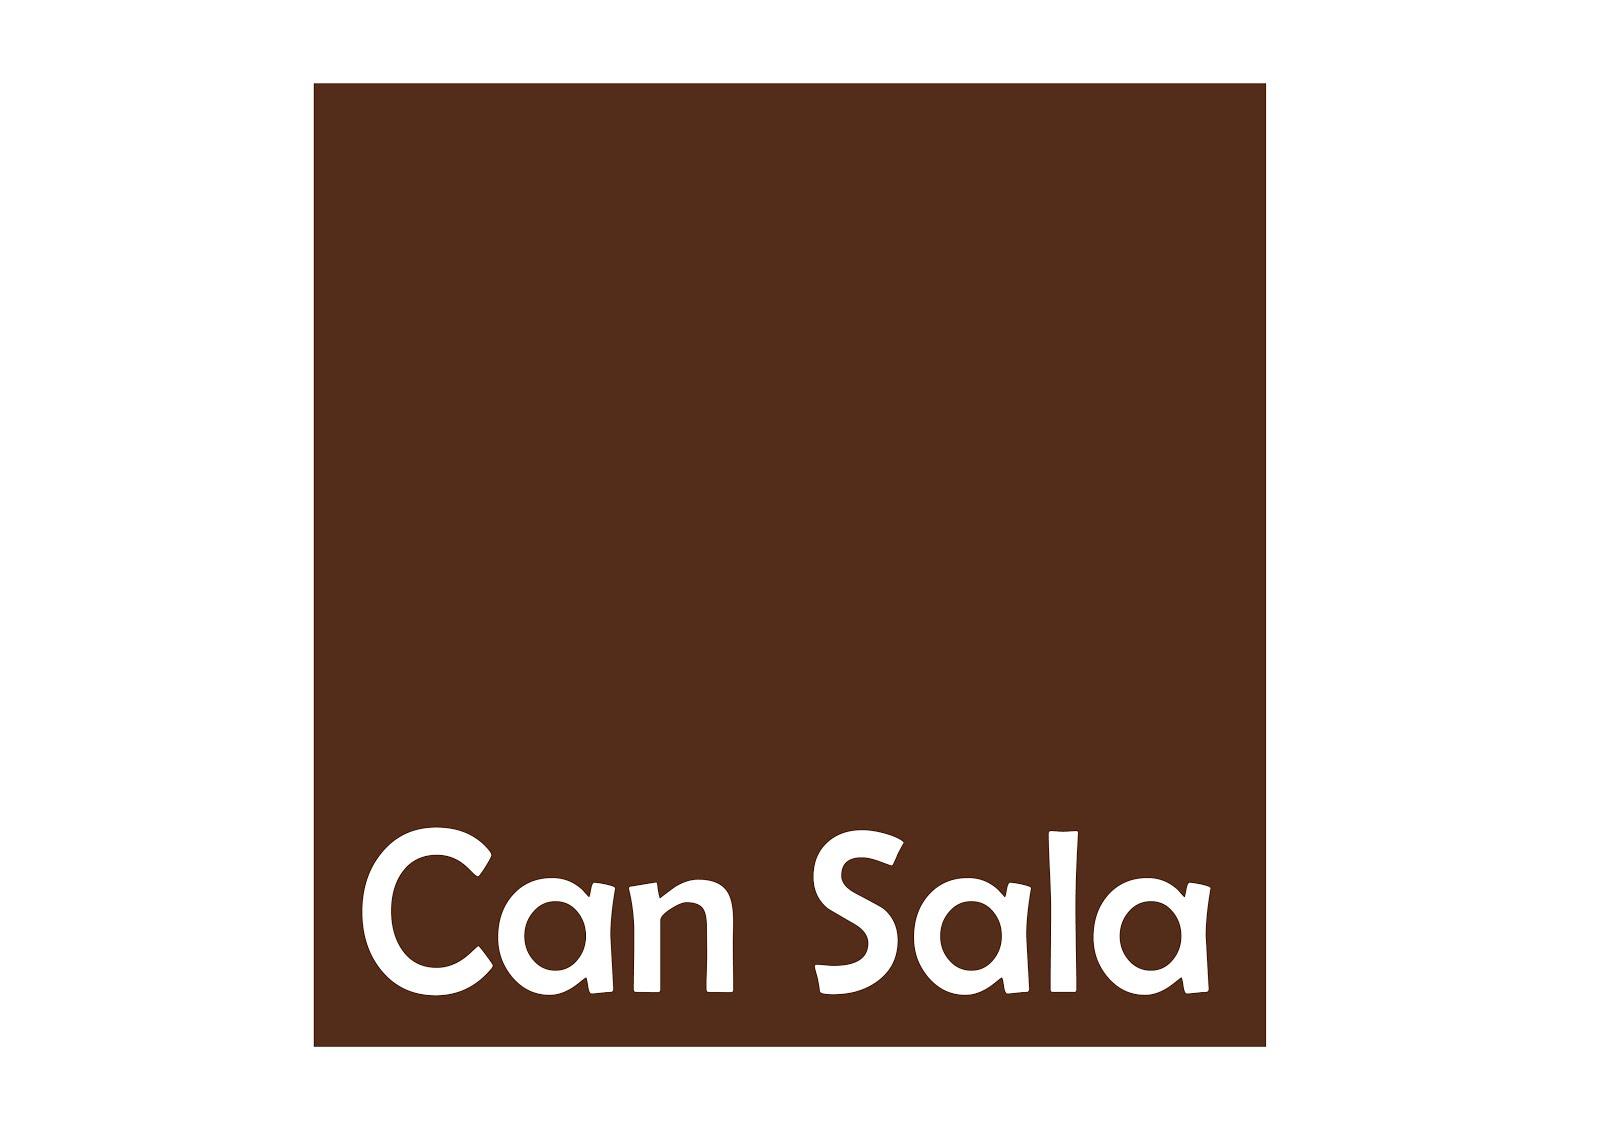 CAN SALA